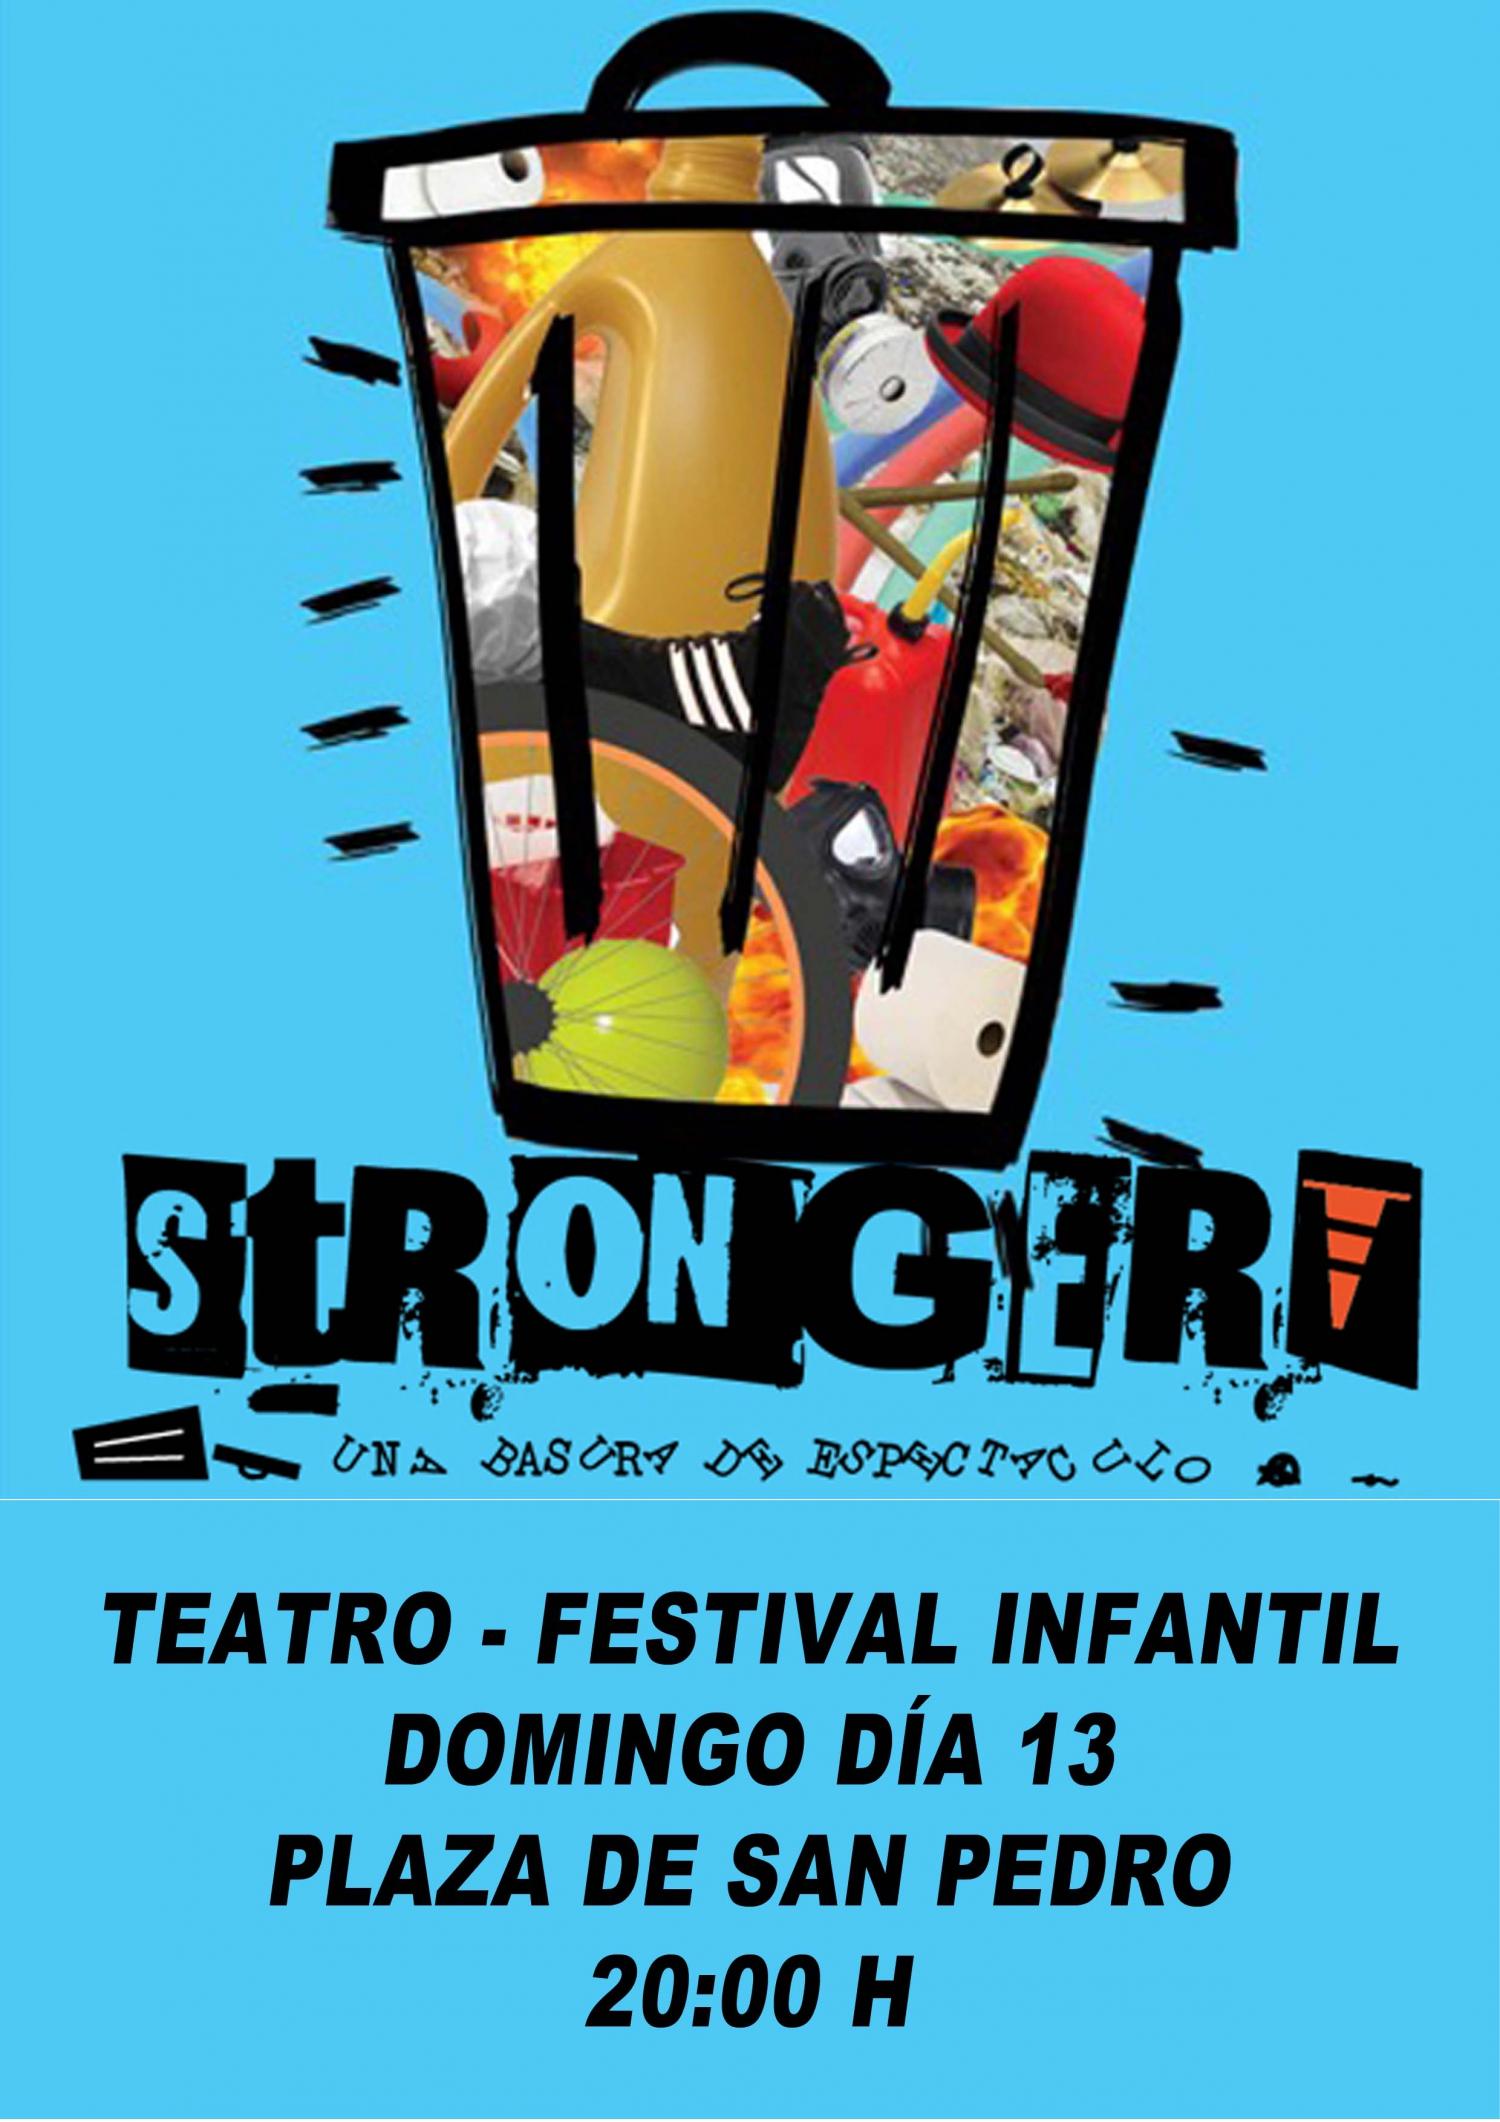 Theatre Festival for Children in Vilaflor